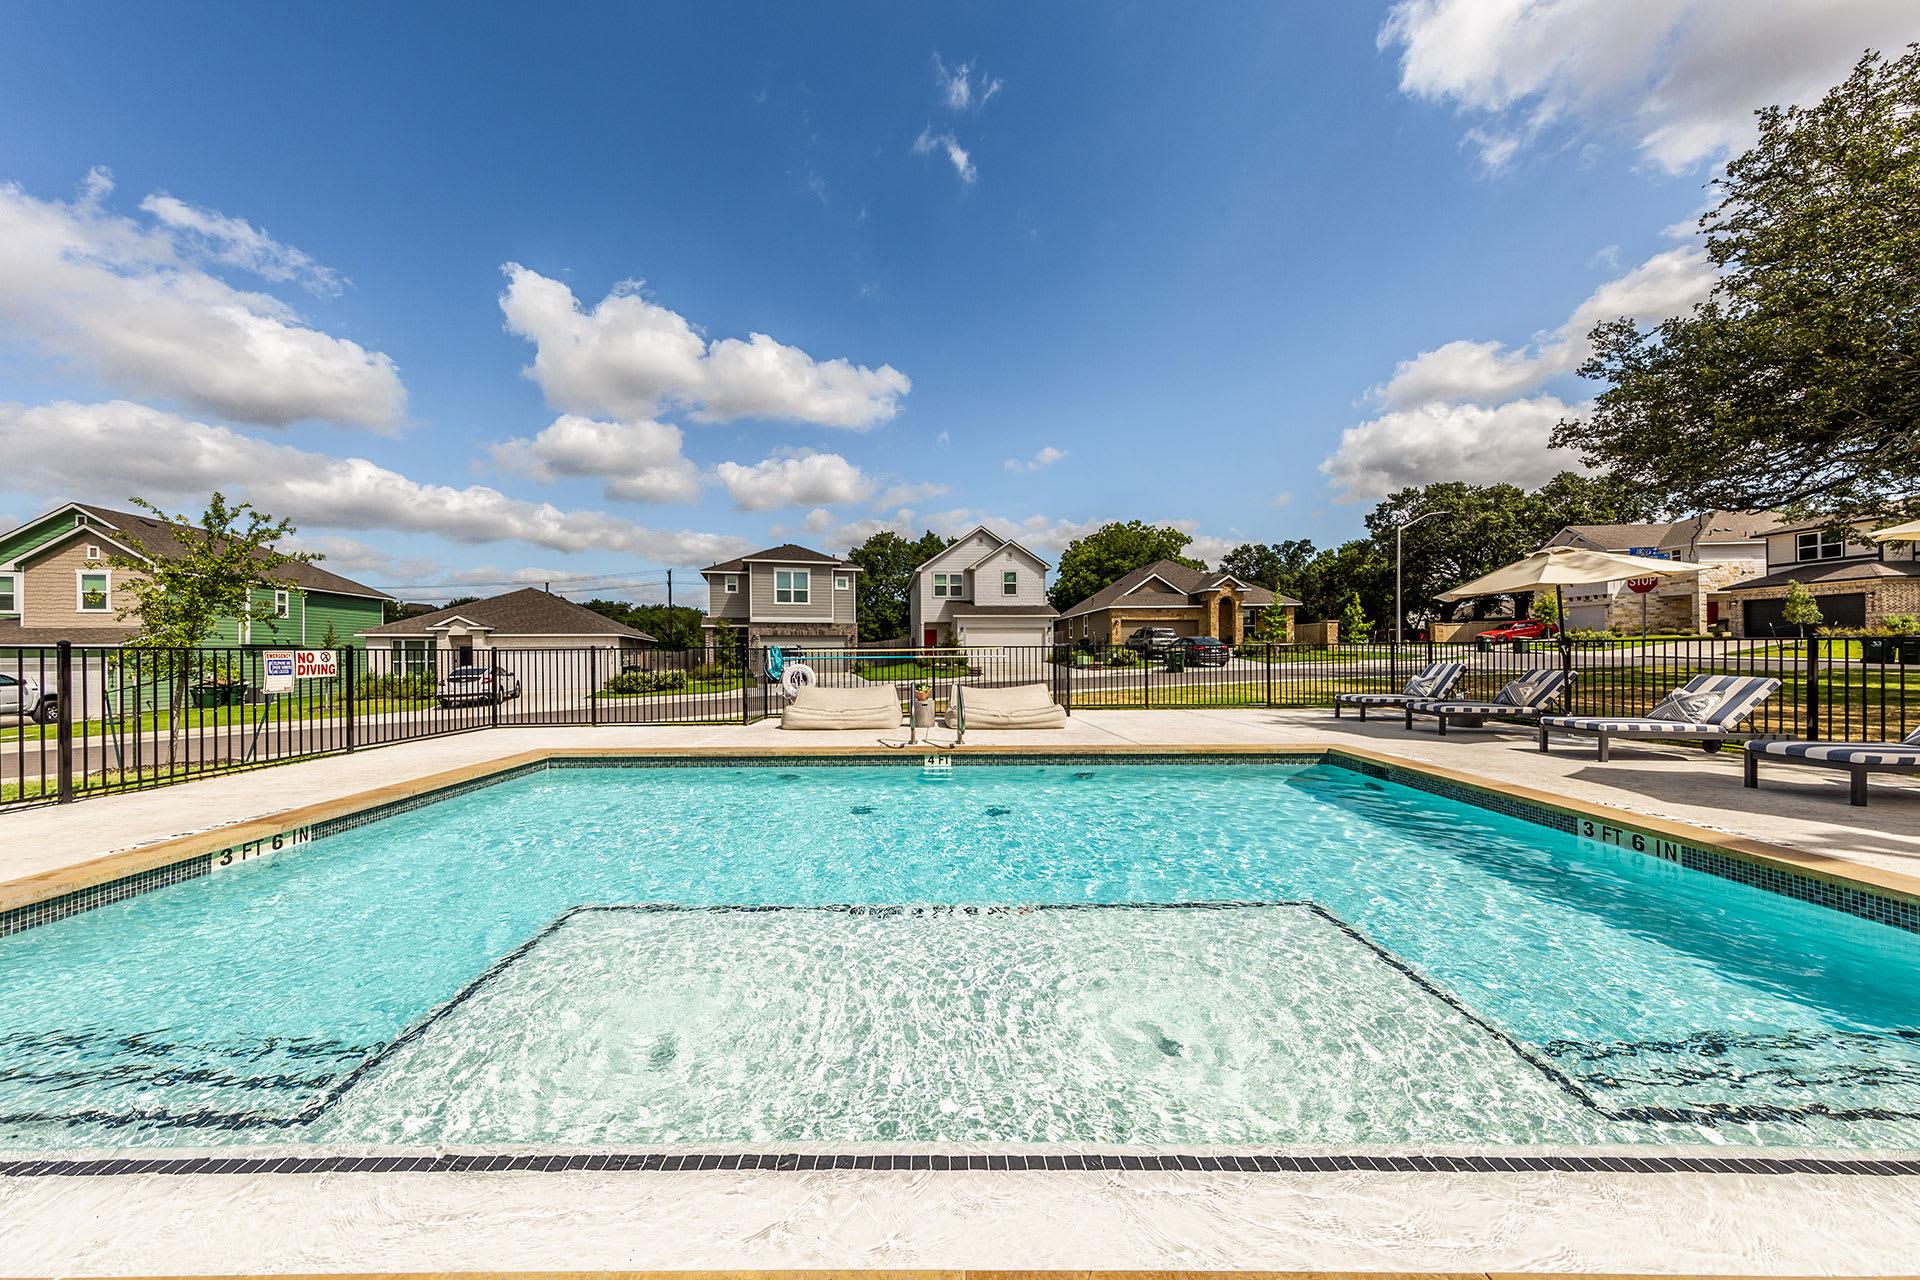 Rivers Edge Apartments Resort-Style Swimming Pool